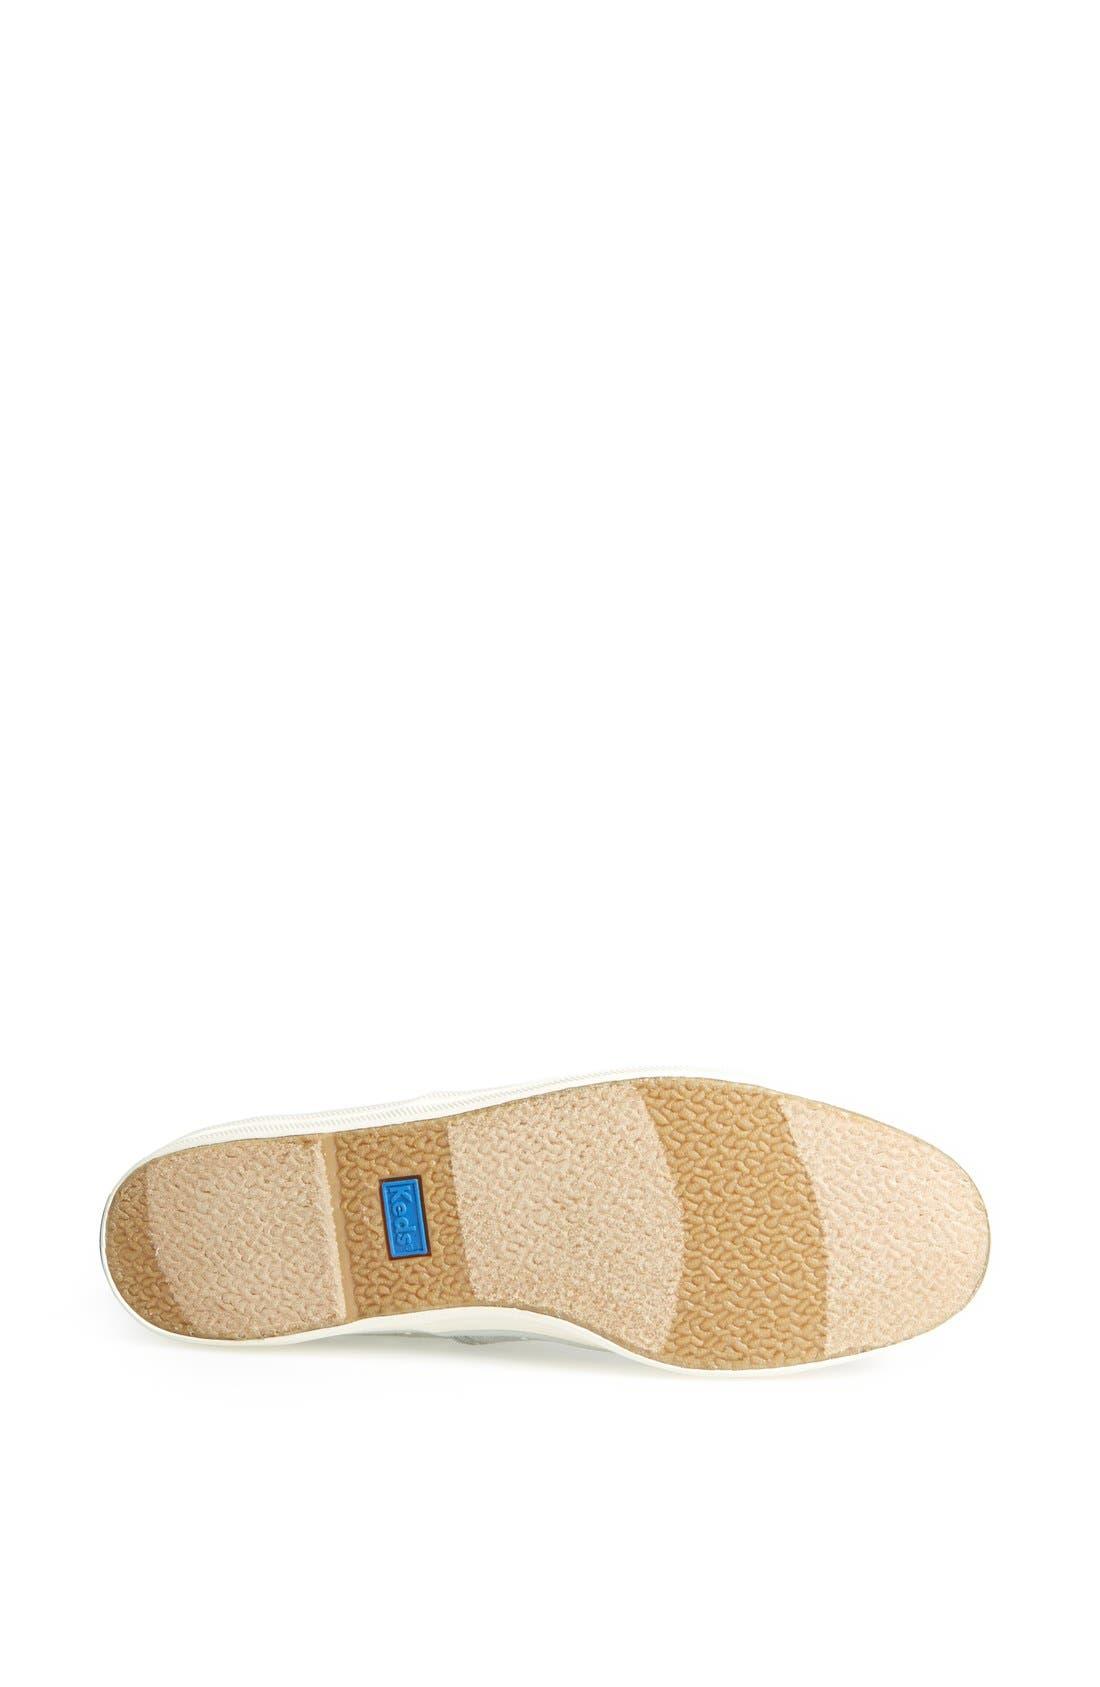 KEDS<SUP>®</SUP>, Taylor Swift Polka Dot Sneaker, Alternate thumbnail 2, color, 020